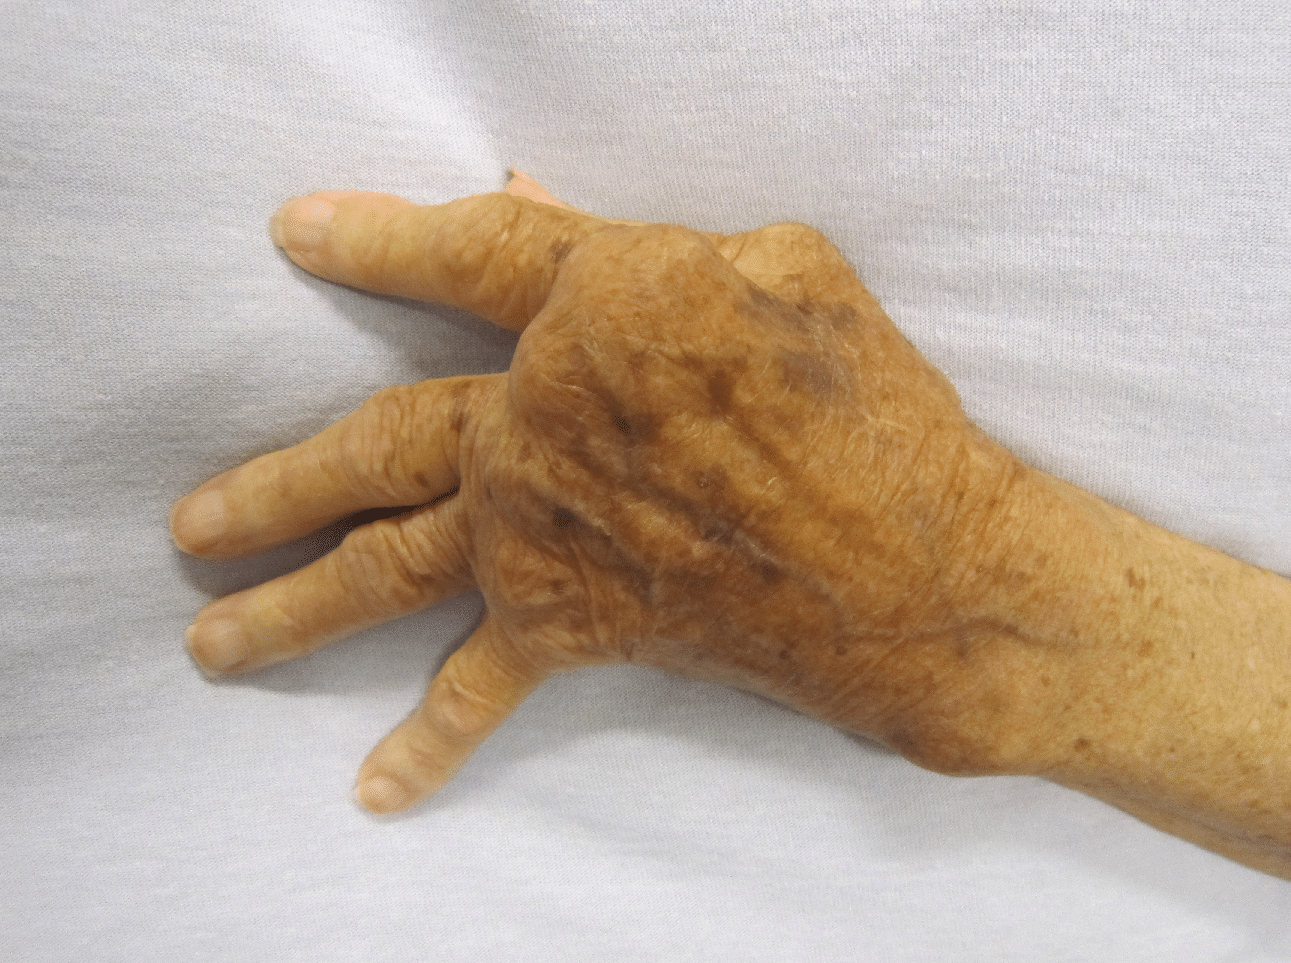 Reumatoïde artritis / Bron: Wikimedia Commons